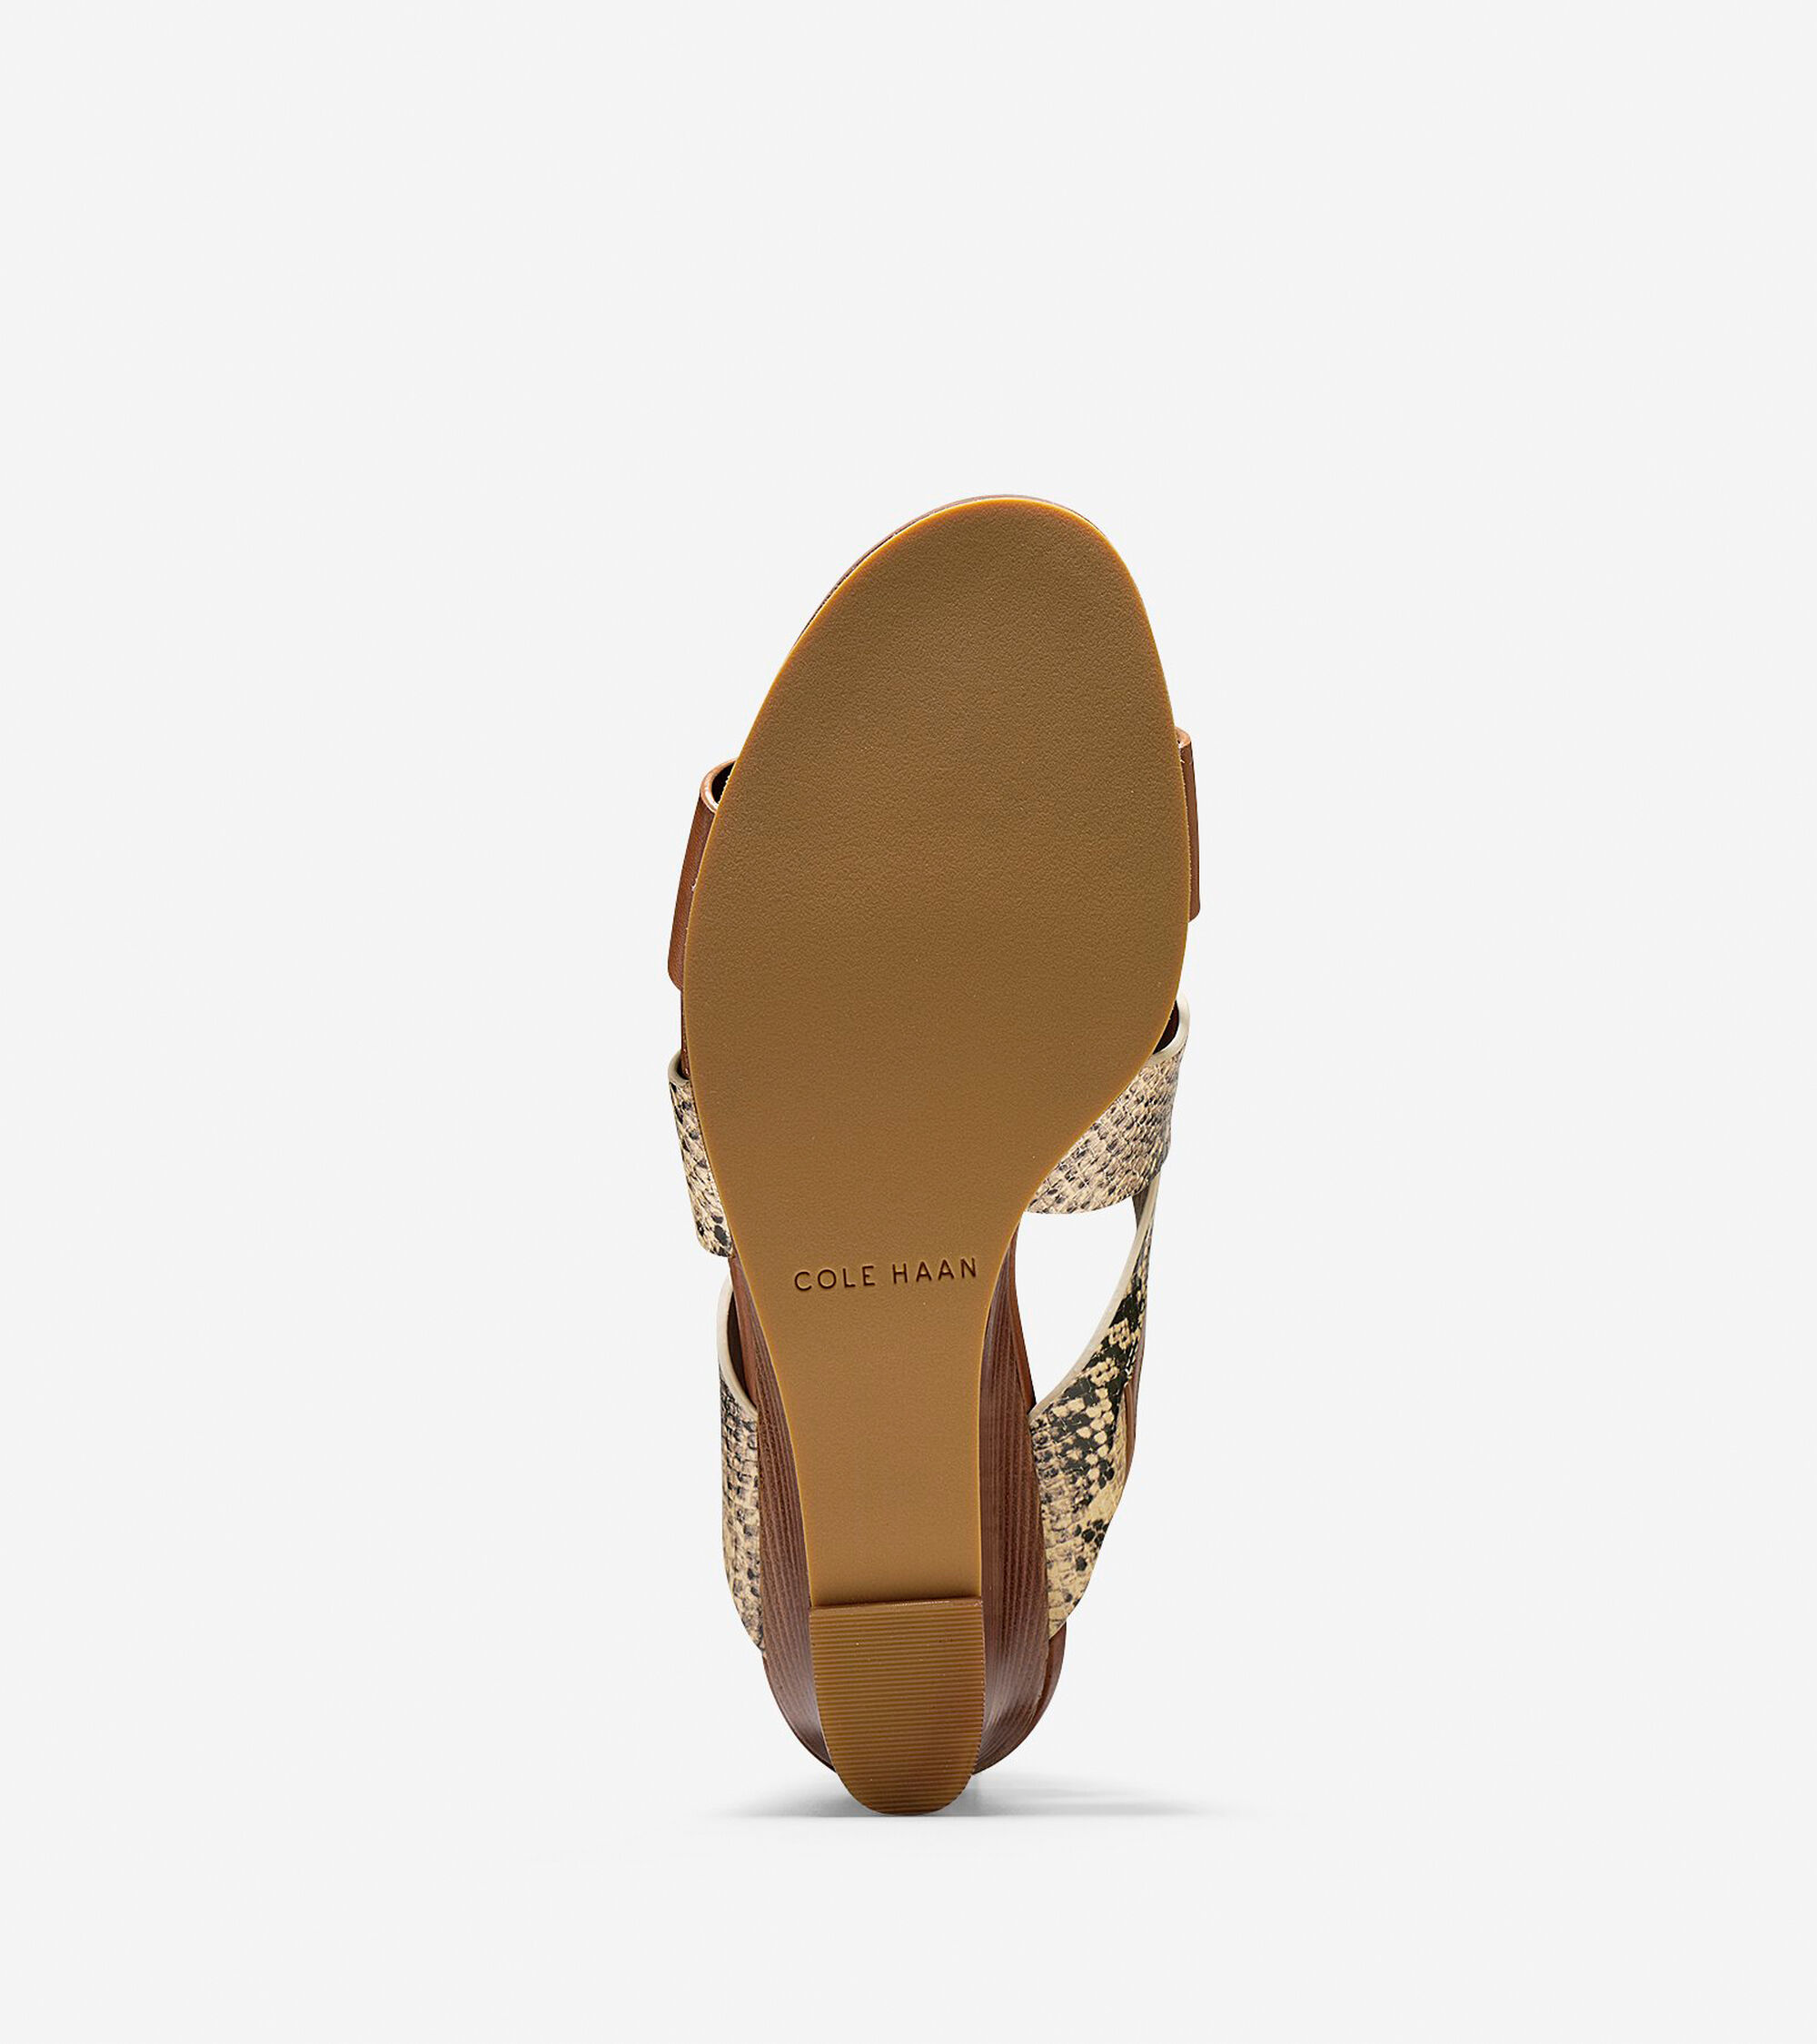 42033a043e70 Penelope Wedge Sandals in Roccia Snake Print-Camello